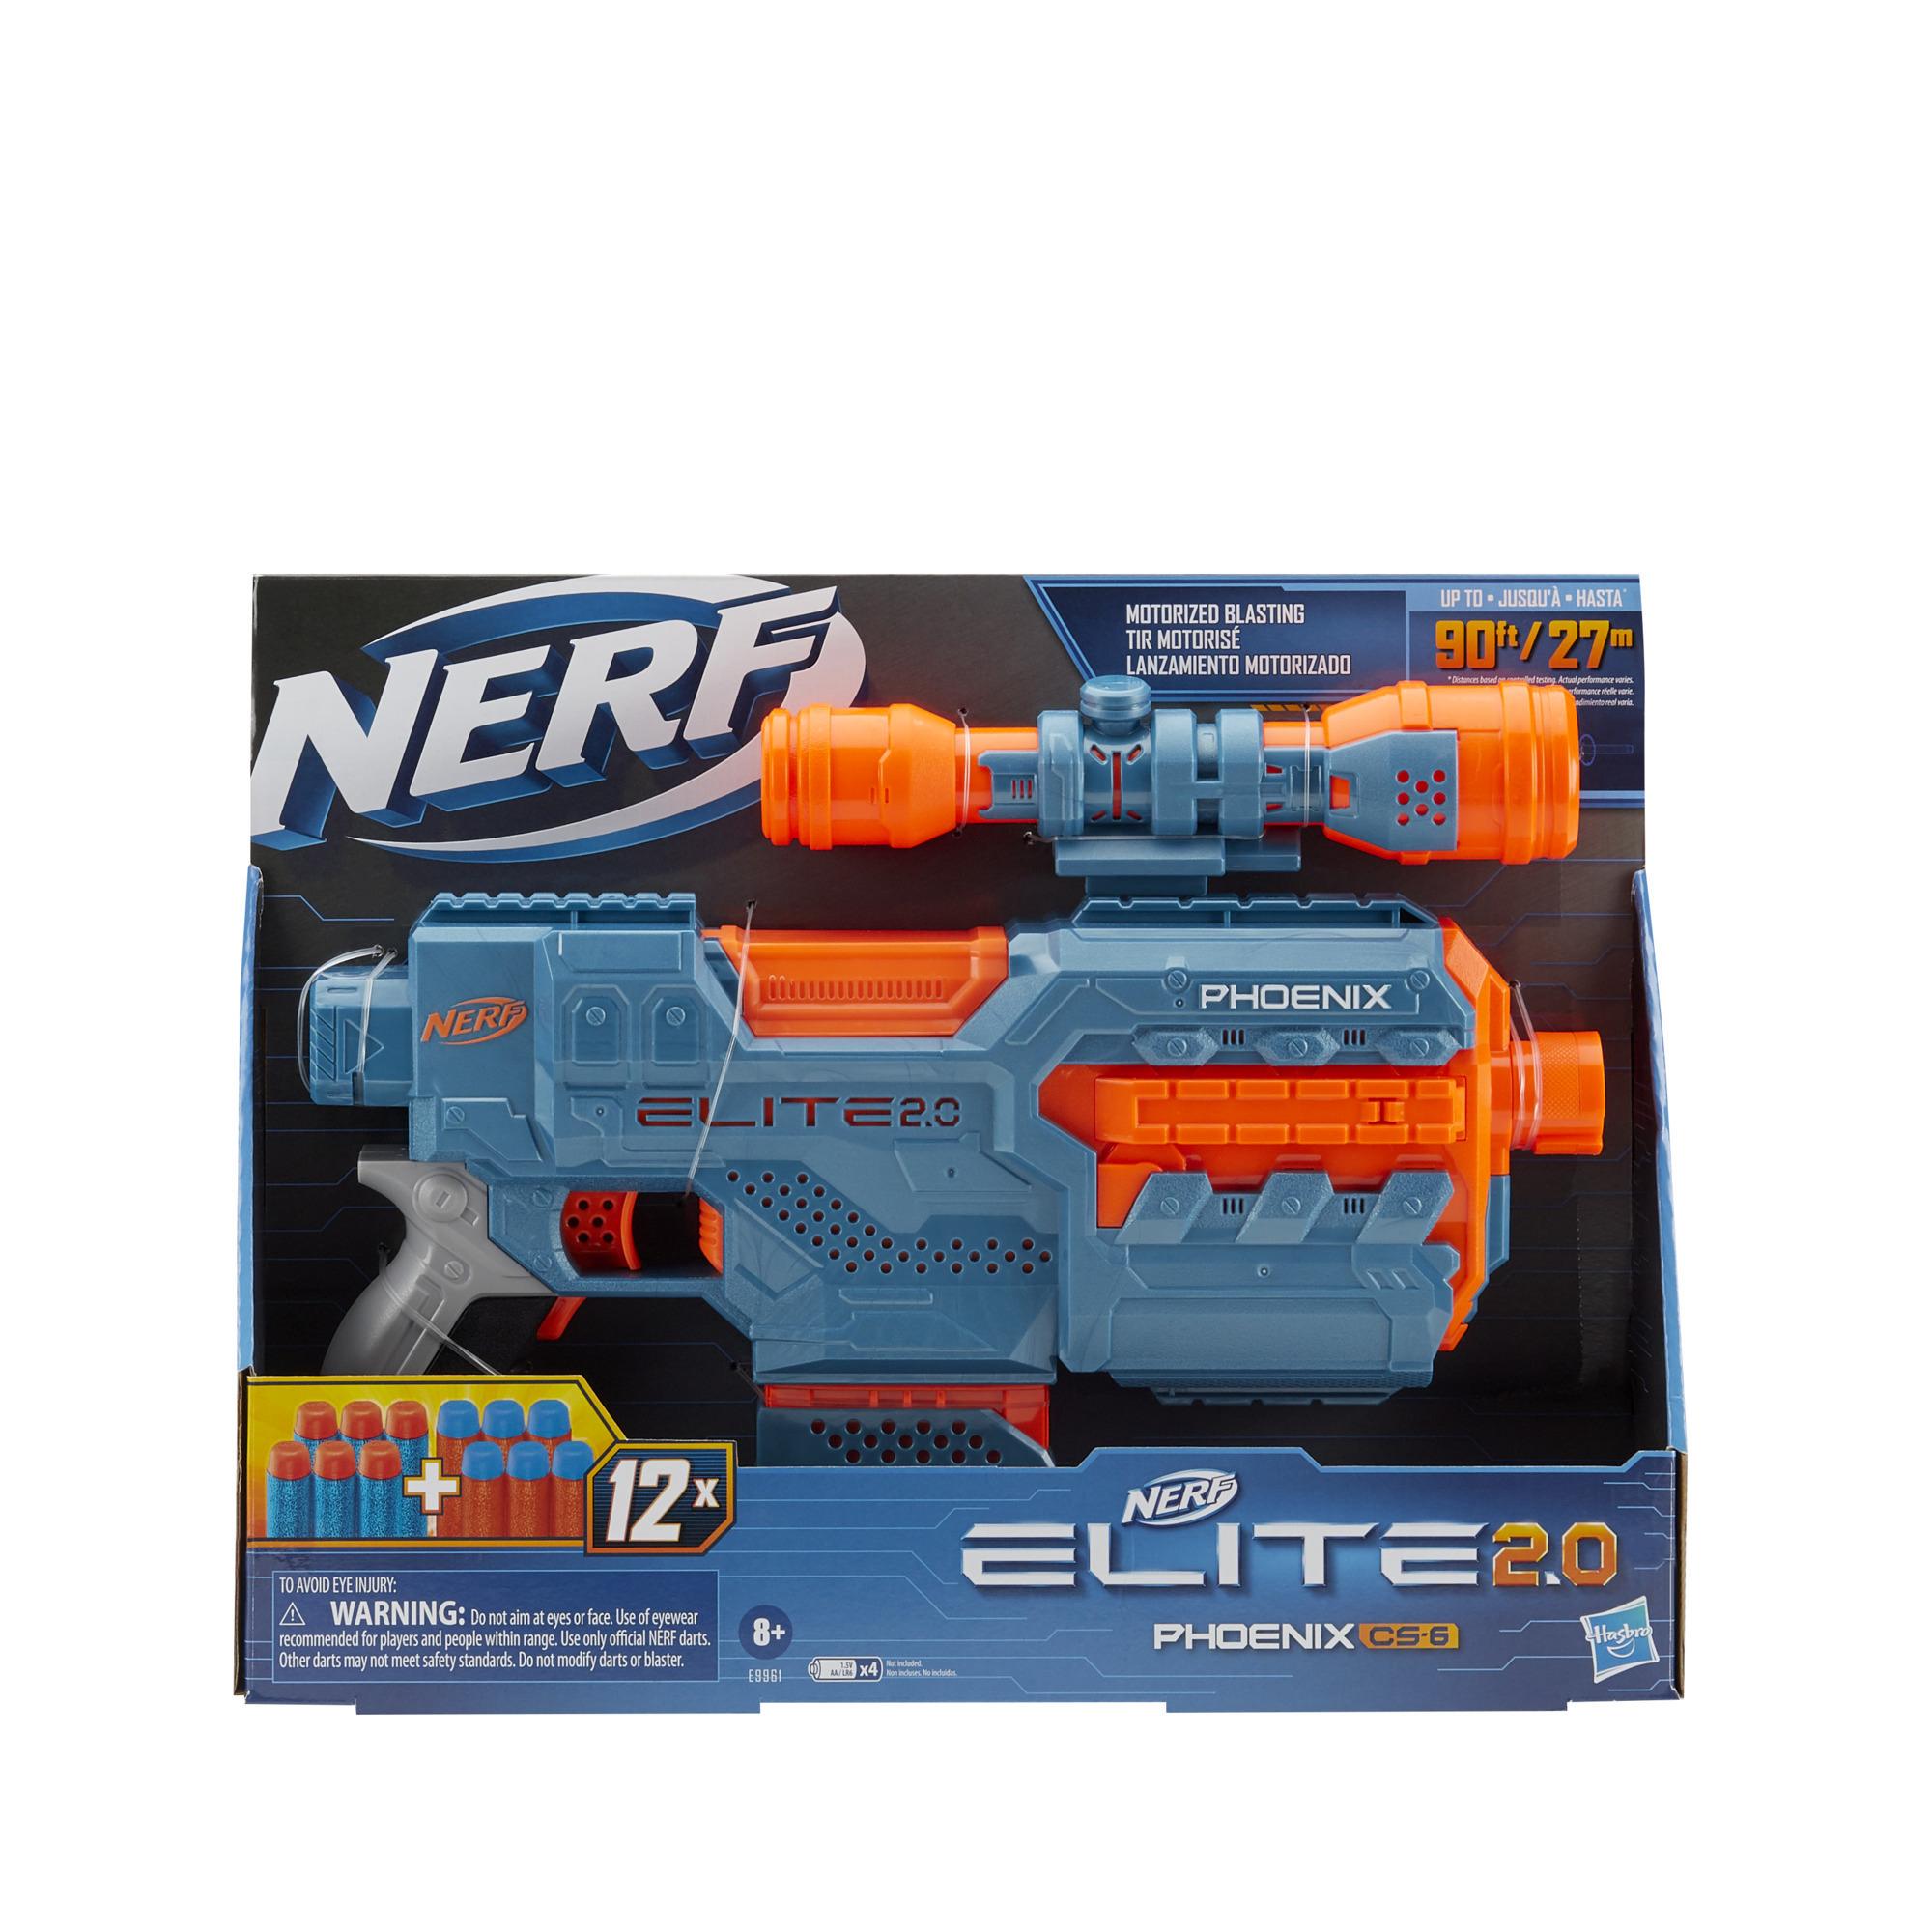 Nerf Elite 2.0 Phoenix CS-6 Motorized Blaster, 12 Official Nerf Darts, Scope, Clip, Built-In Customizing Capabilities